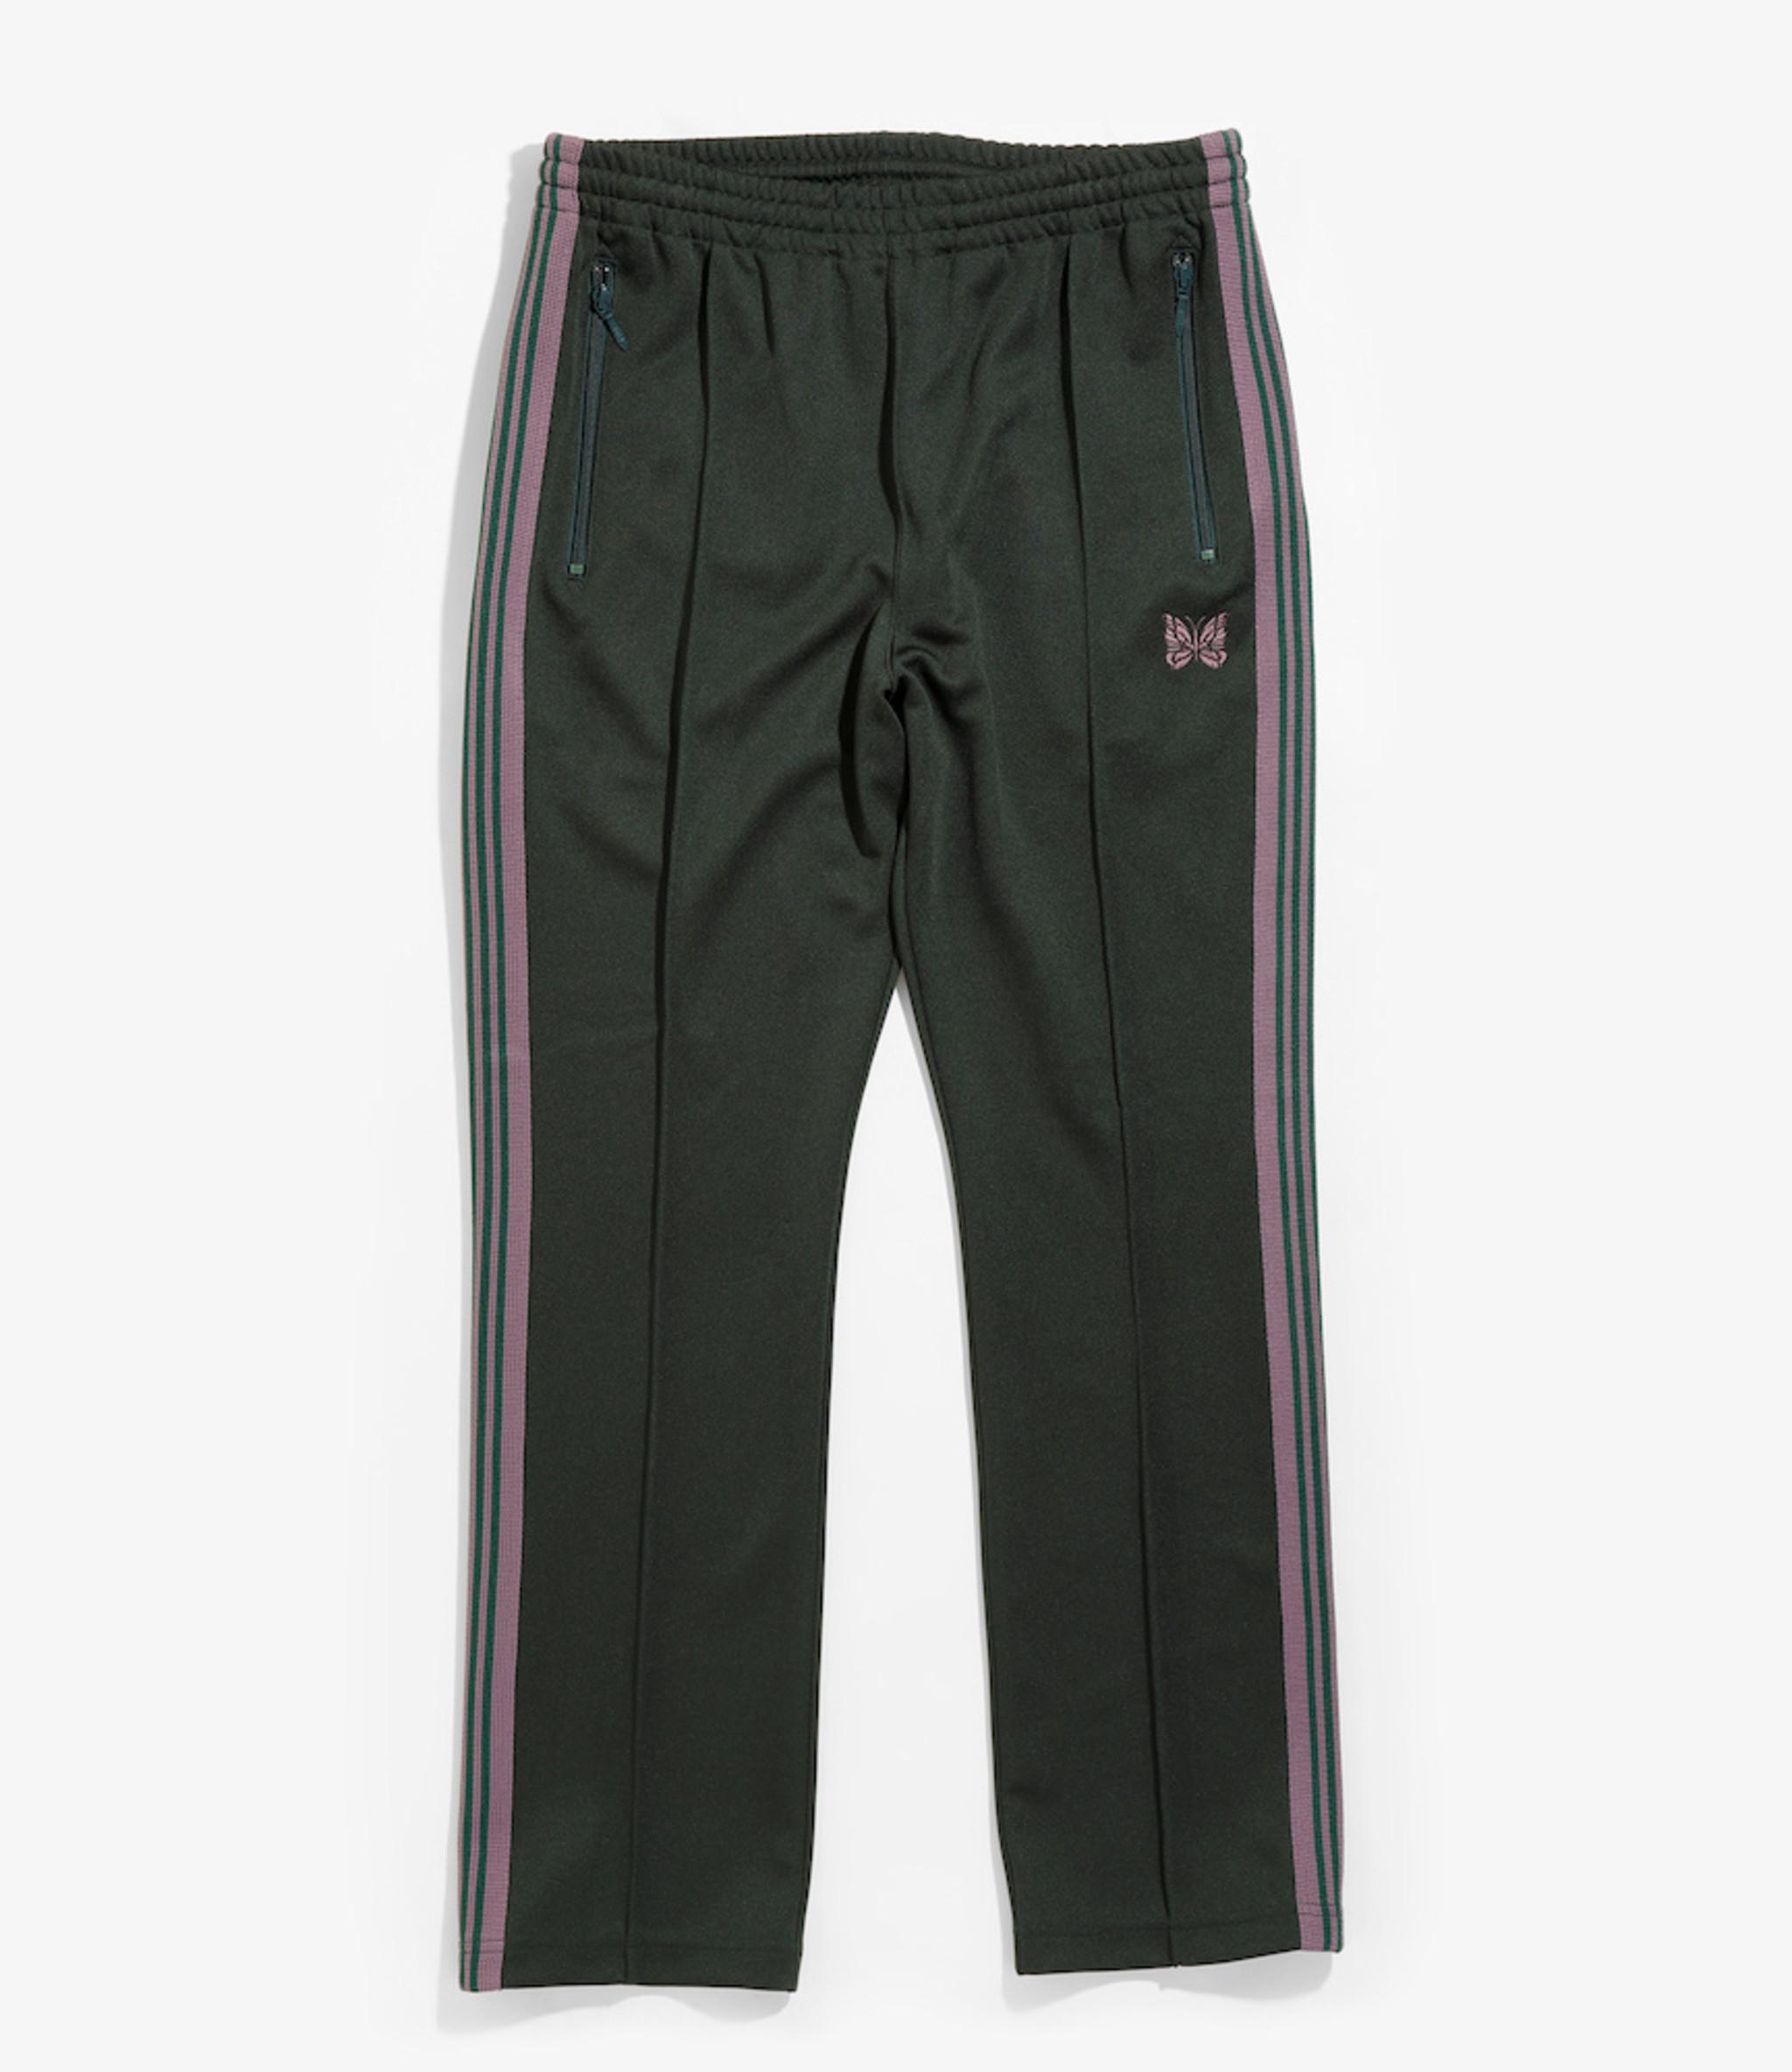 Needles Narrow Track Pant - Poly Smooth - Green